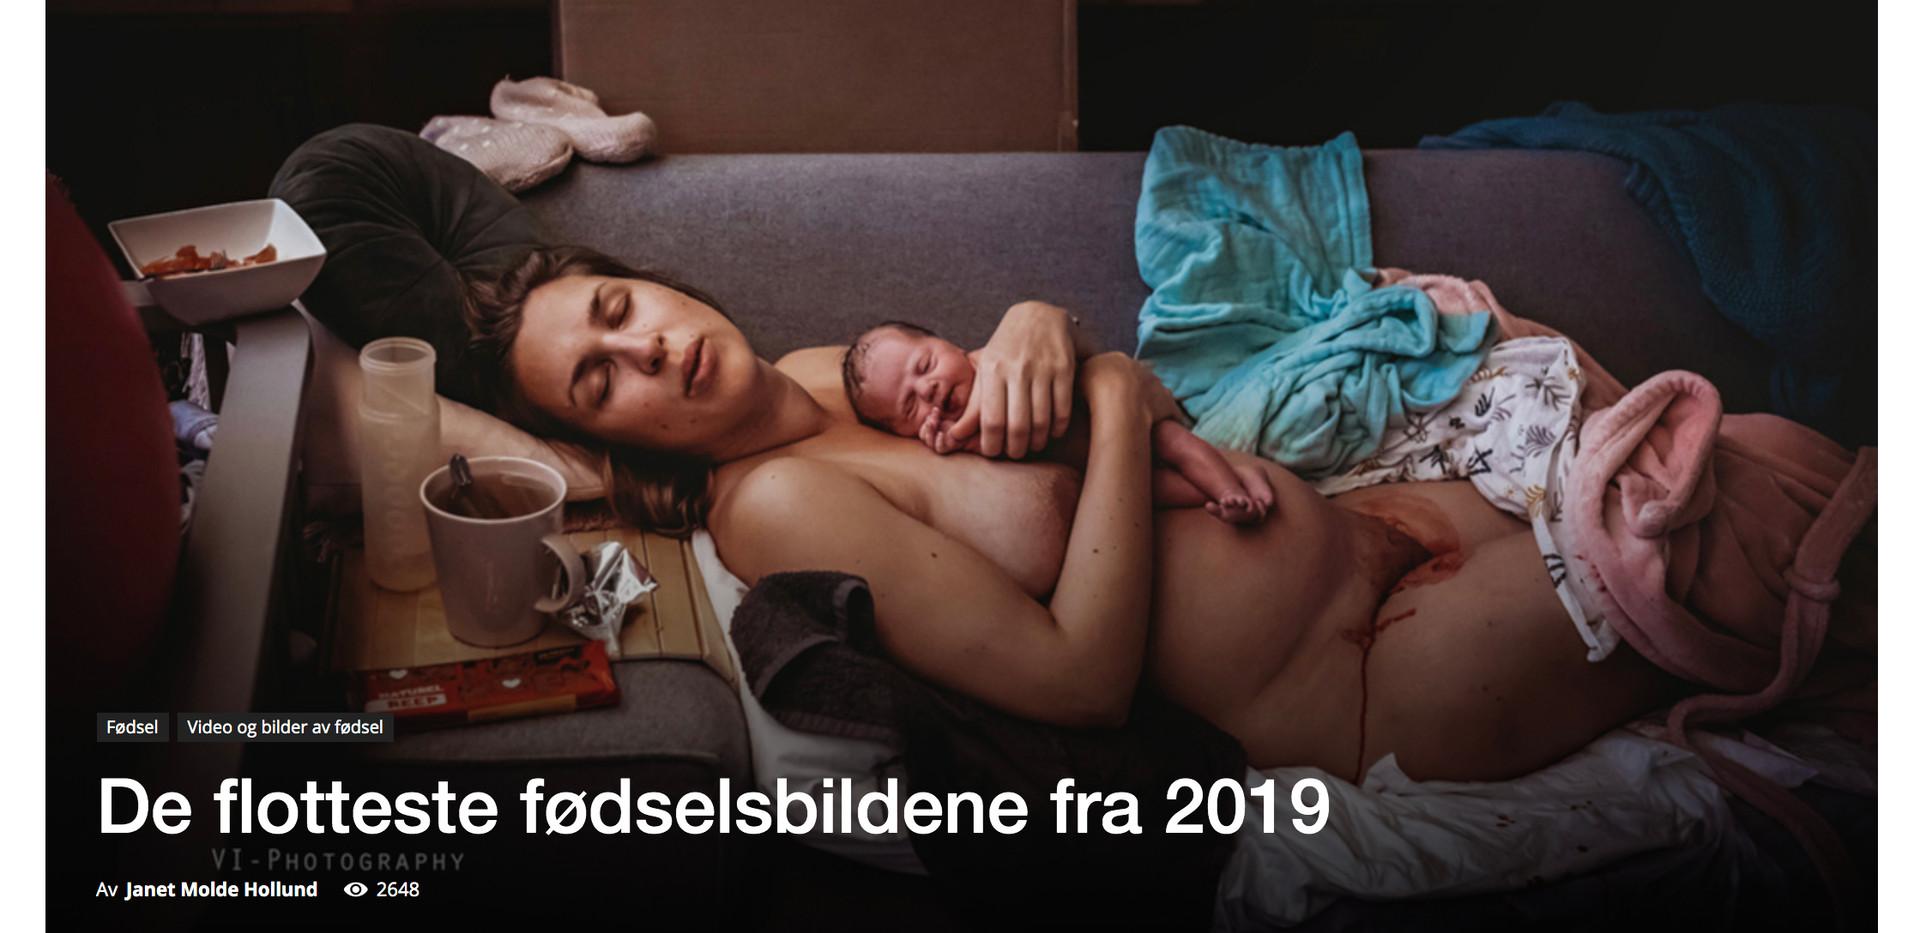 babyverden.no.jpg